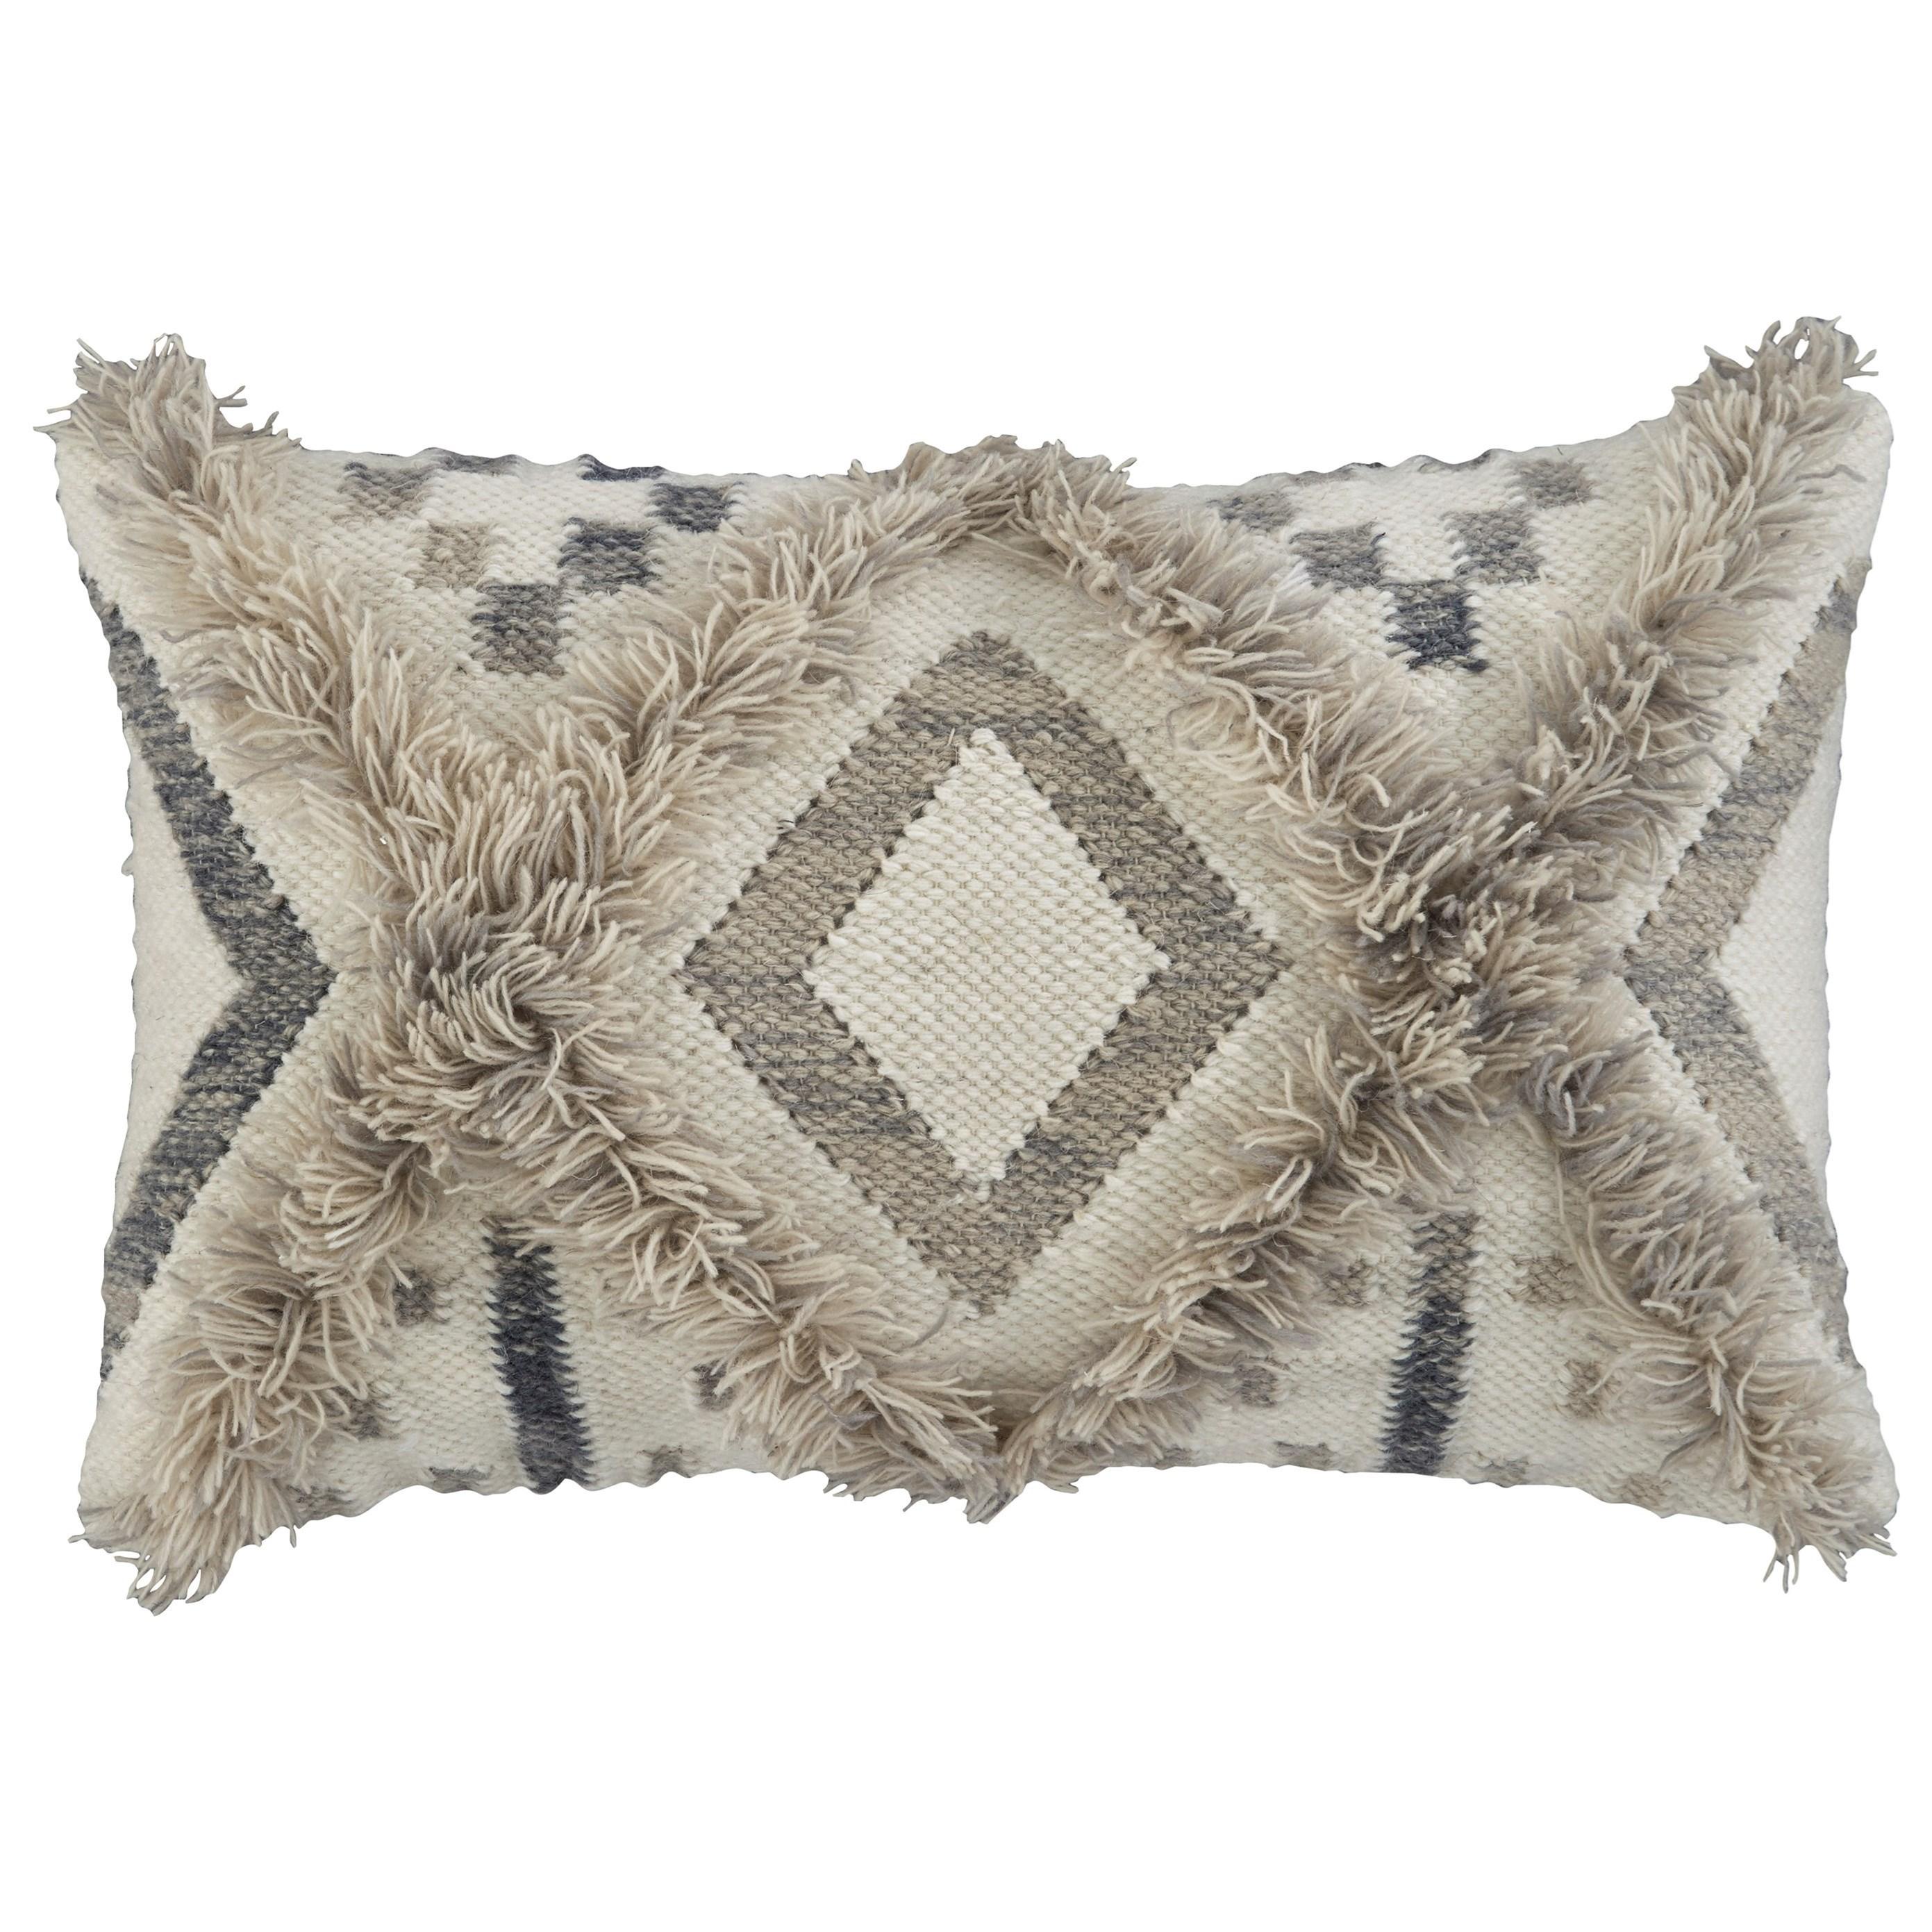 Pillows Liviah Natural Pillow by Ashley (Signature Design) at Johnny Janosik